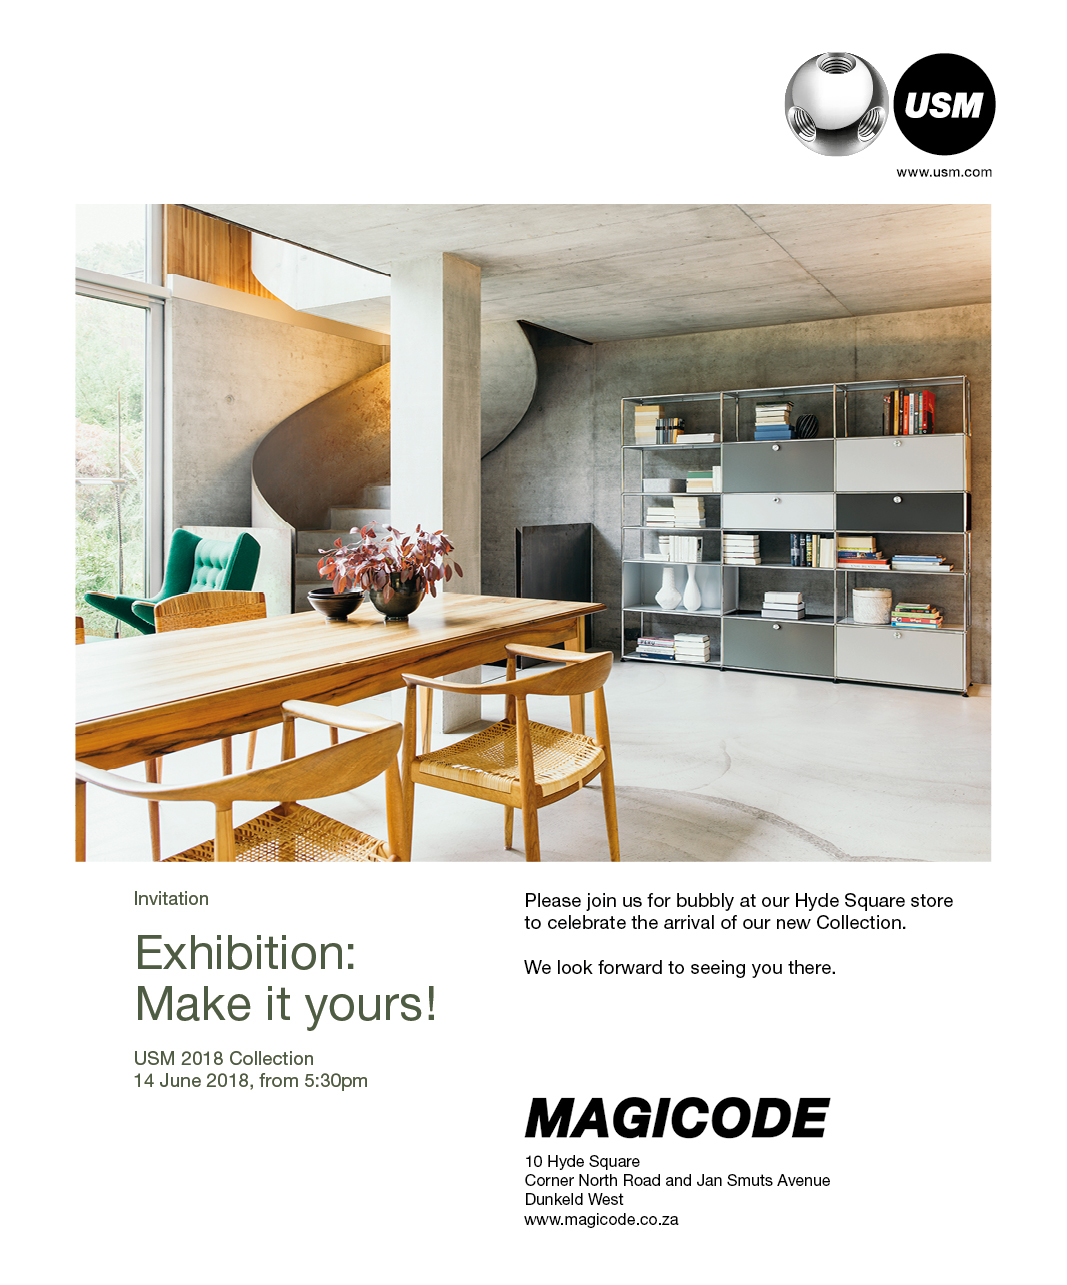 Exhibition invitation – USM 2018 Collection: 14 June 2018